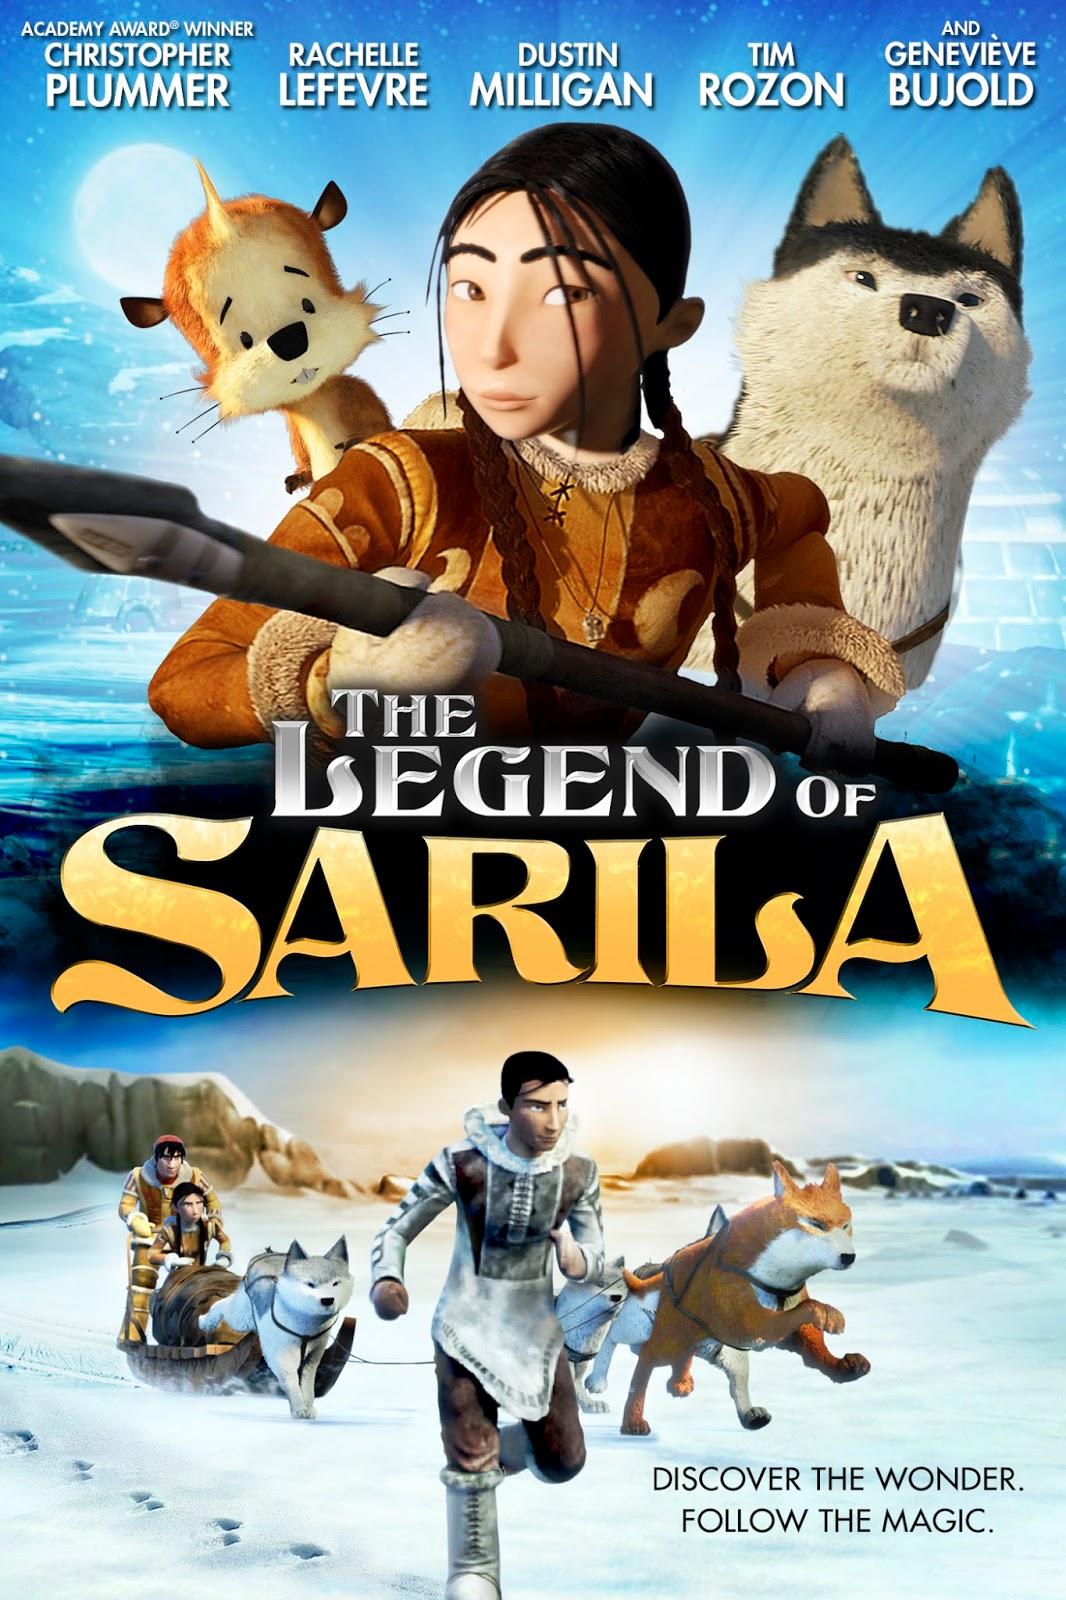 The Legend of Sarila ตามล่าตำนานแดนสวรรค์ [HD][พากย์ไทย]